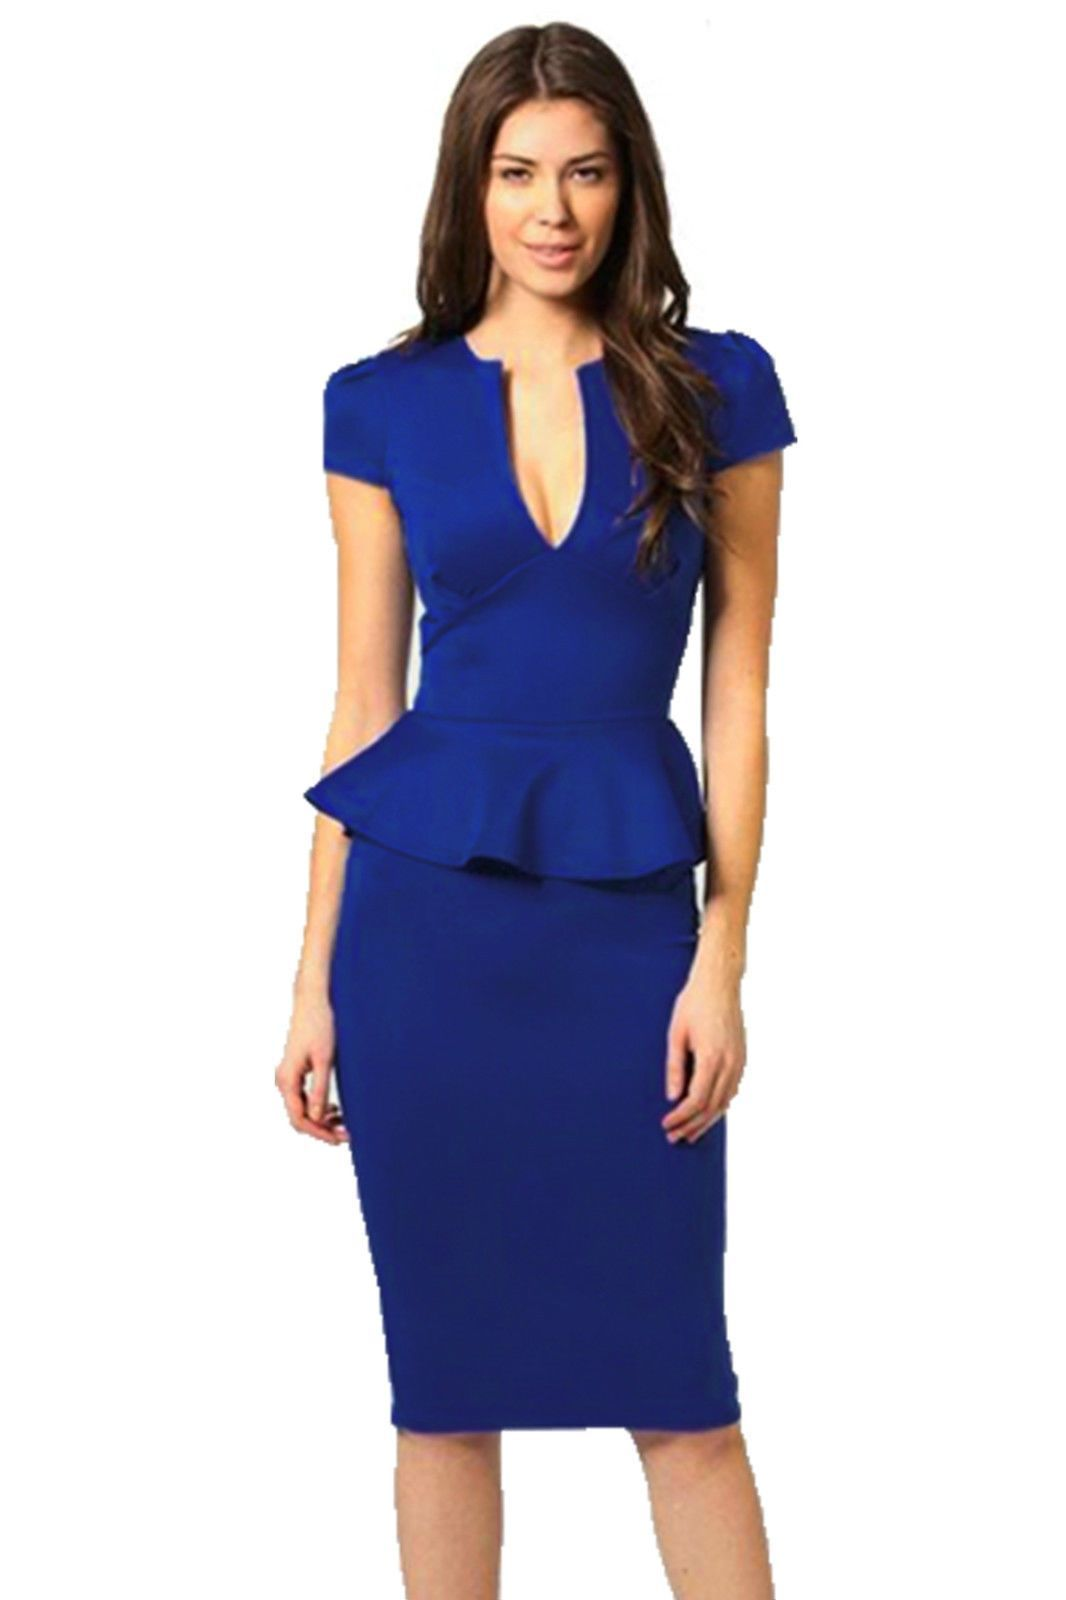 90cb7aa6e98 Lady Elegant Cap Sleeve V Neck Peplum Skirt Knee Length Women S Pencil Dress